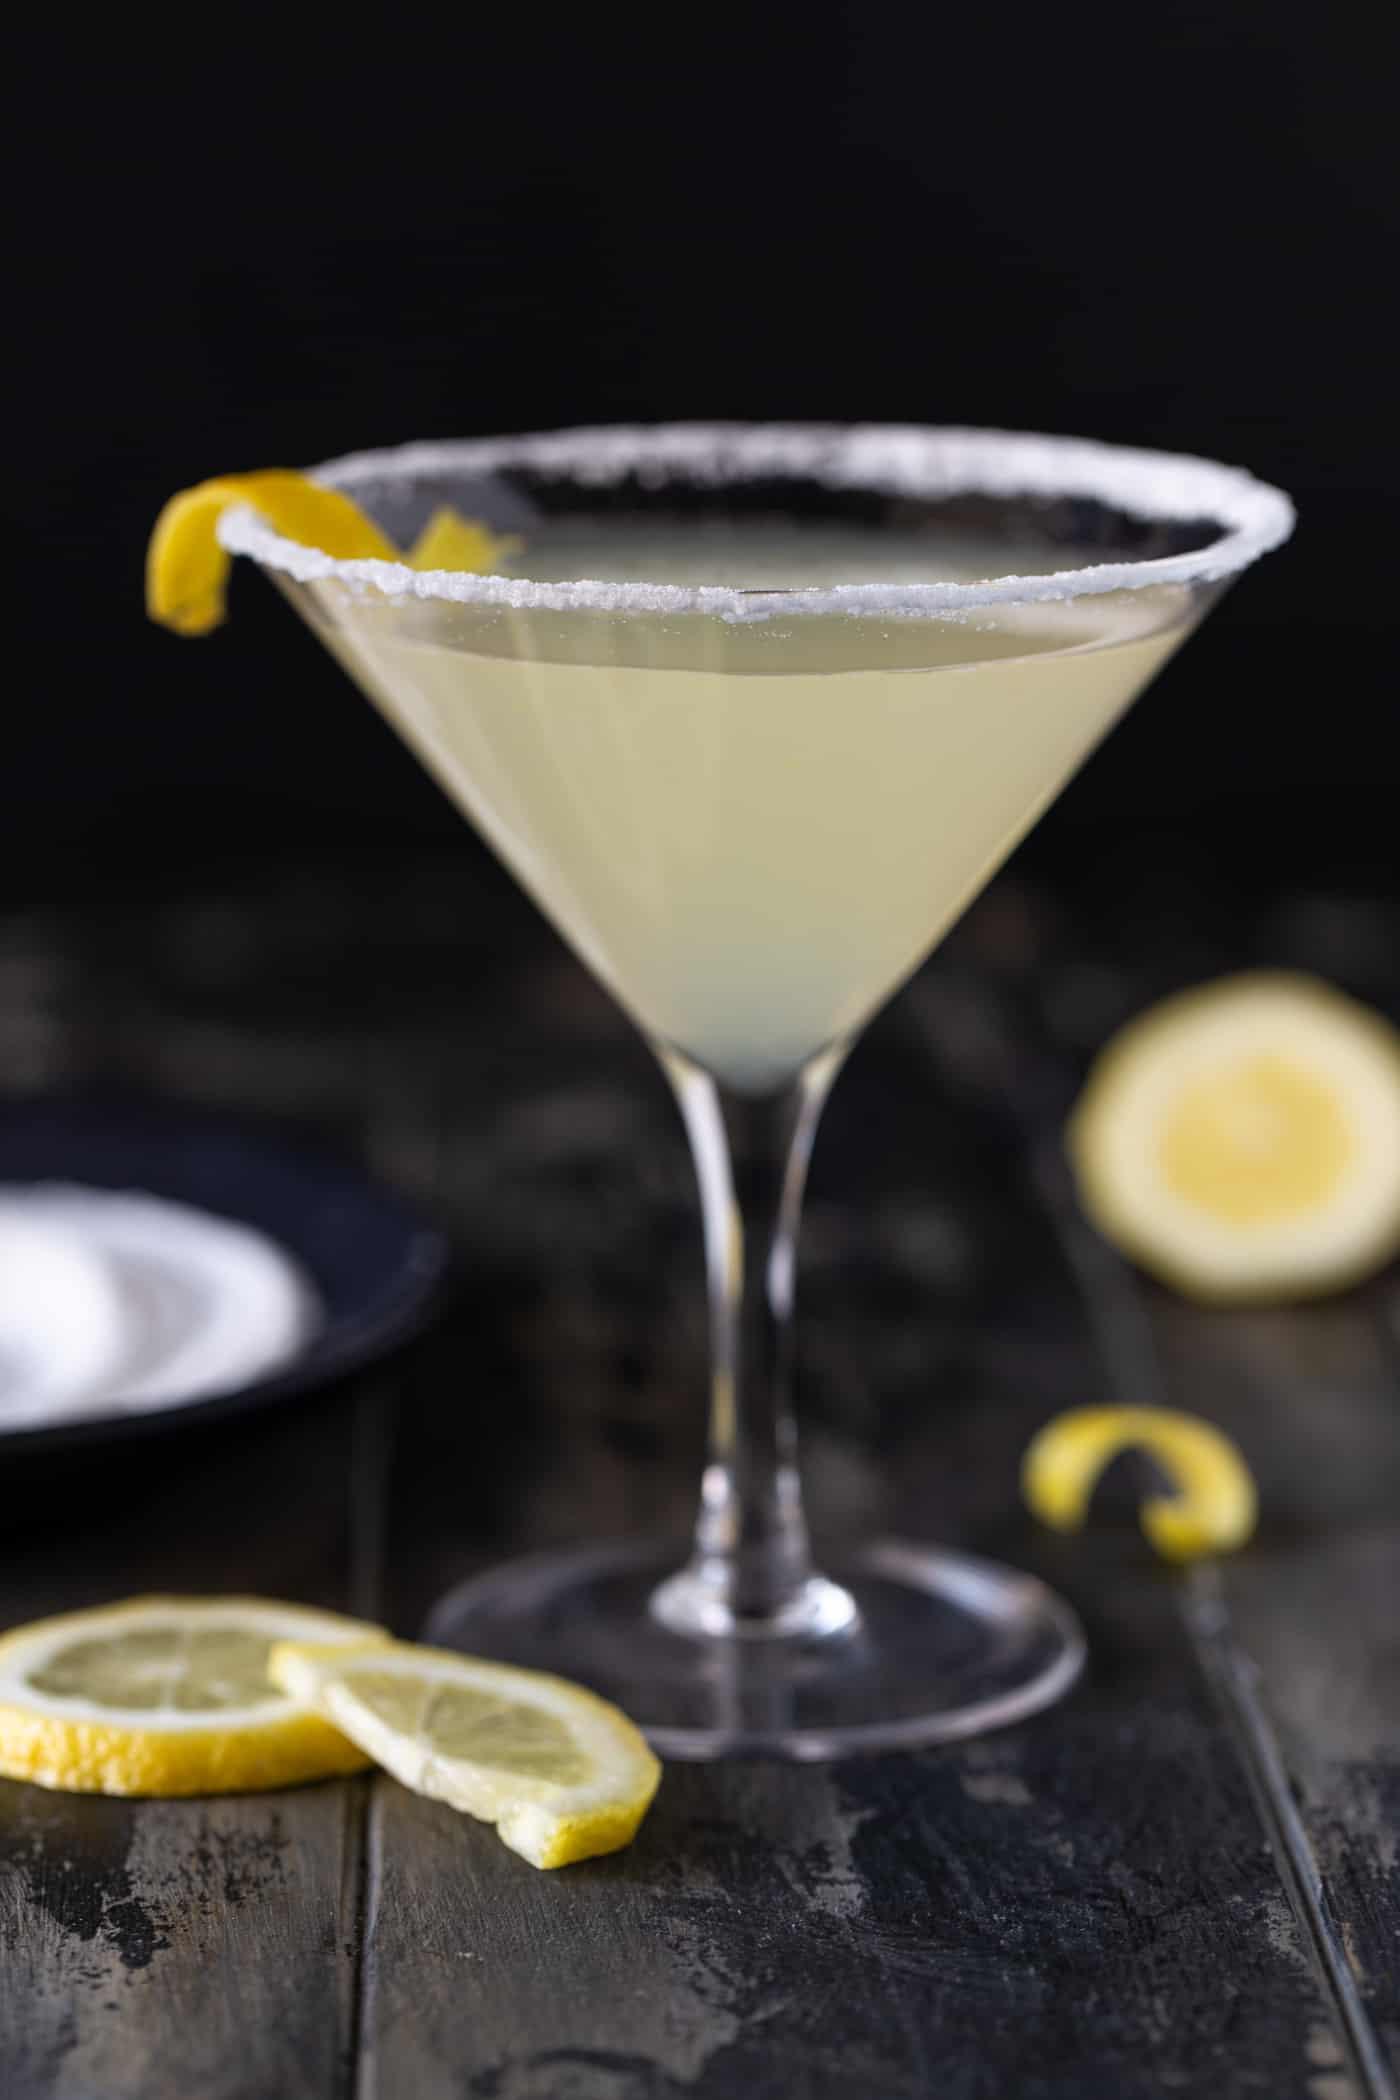 martini in a short martini glass a sugar rim and lemon twists for garnish.